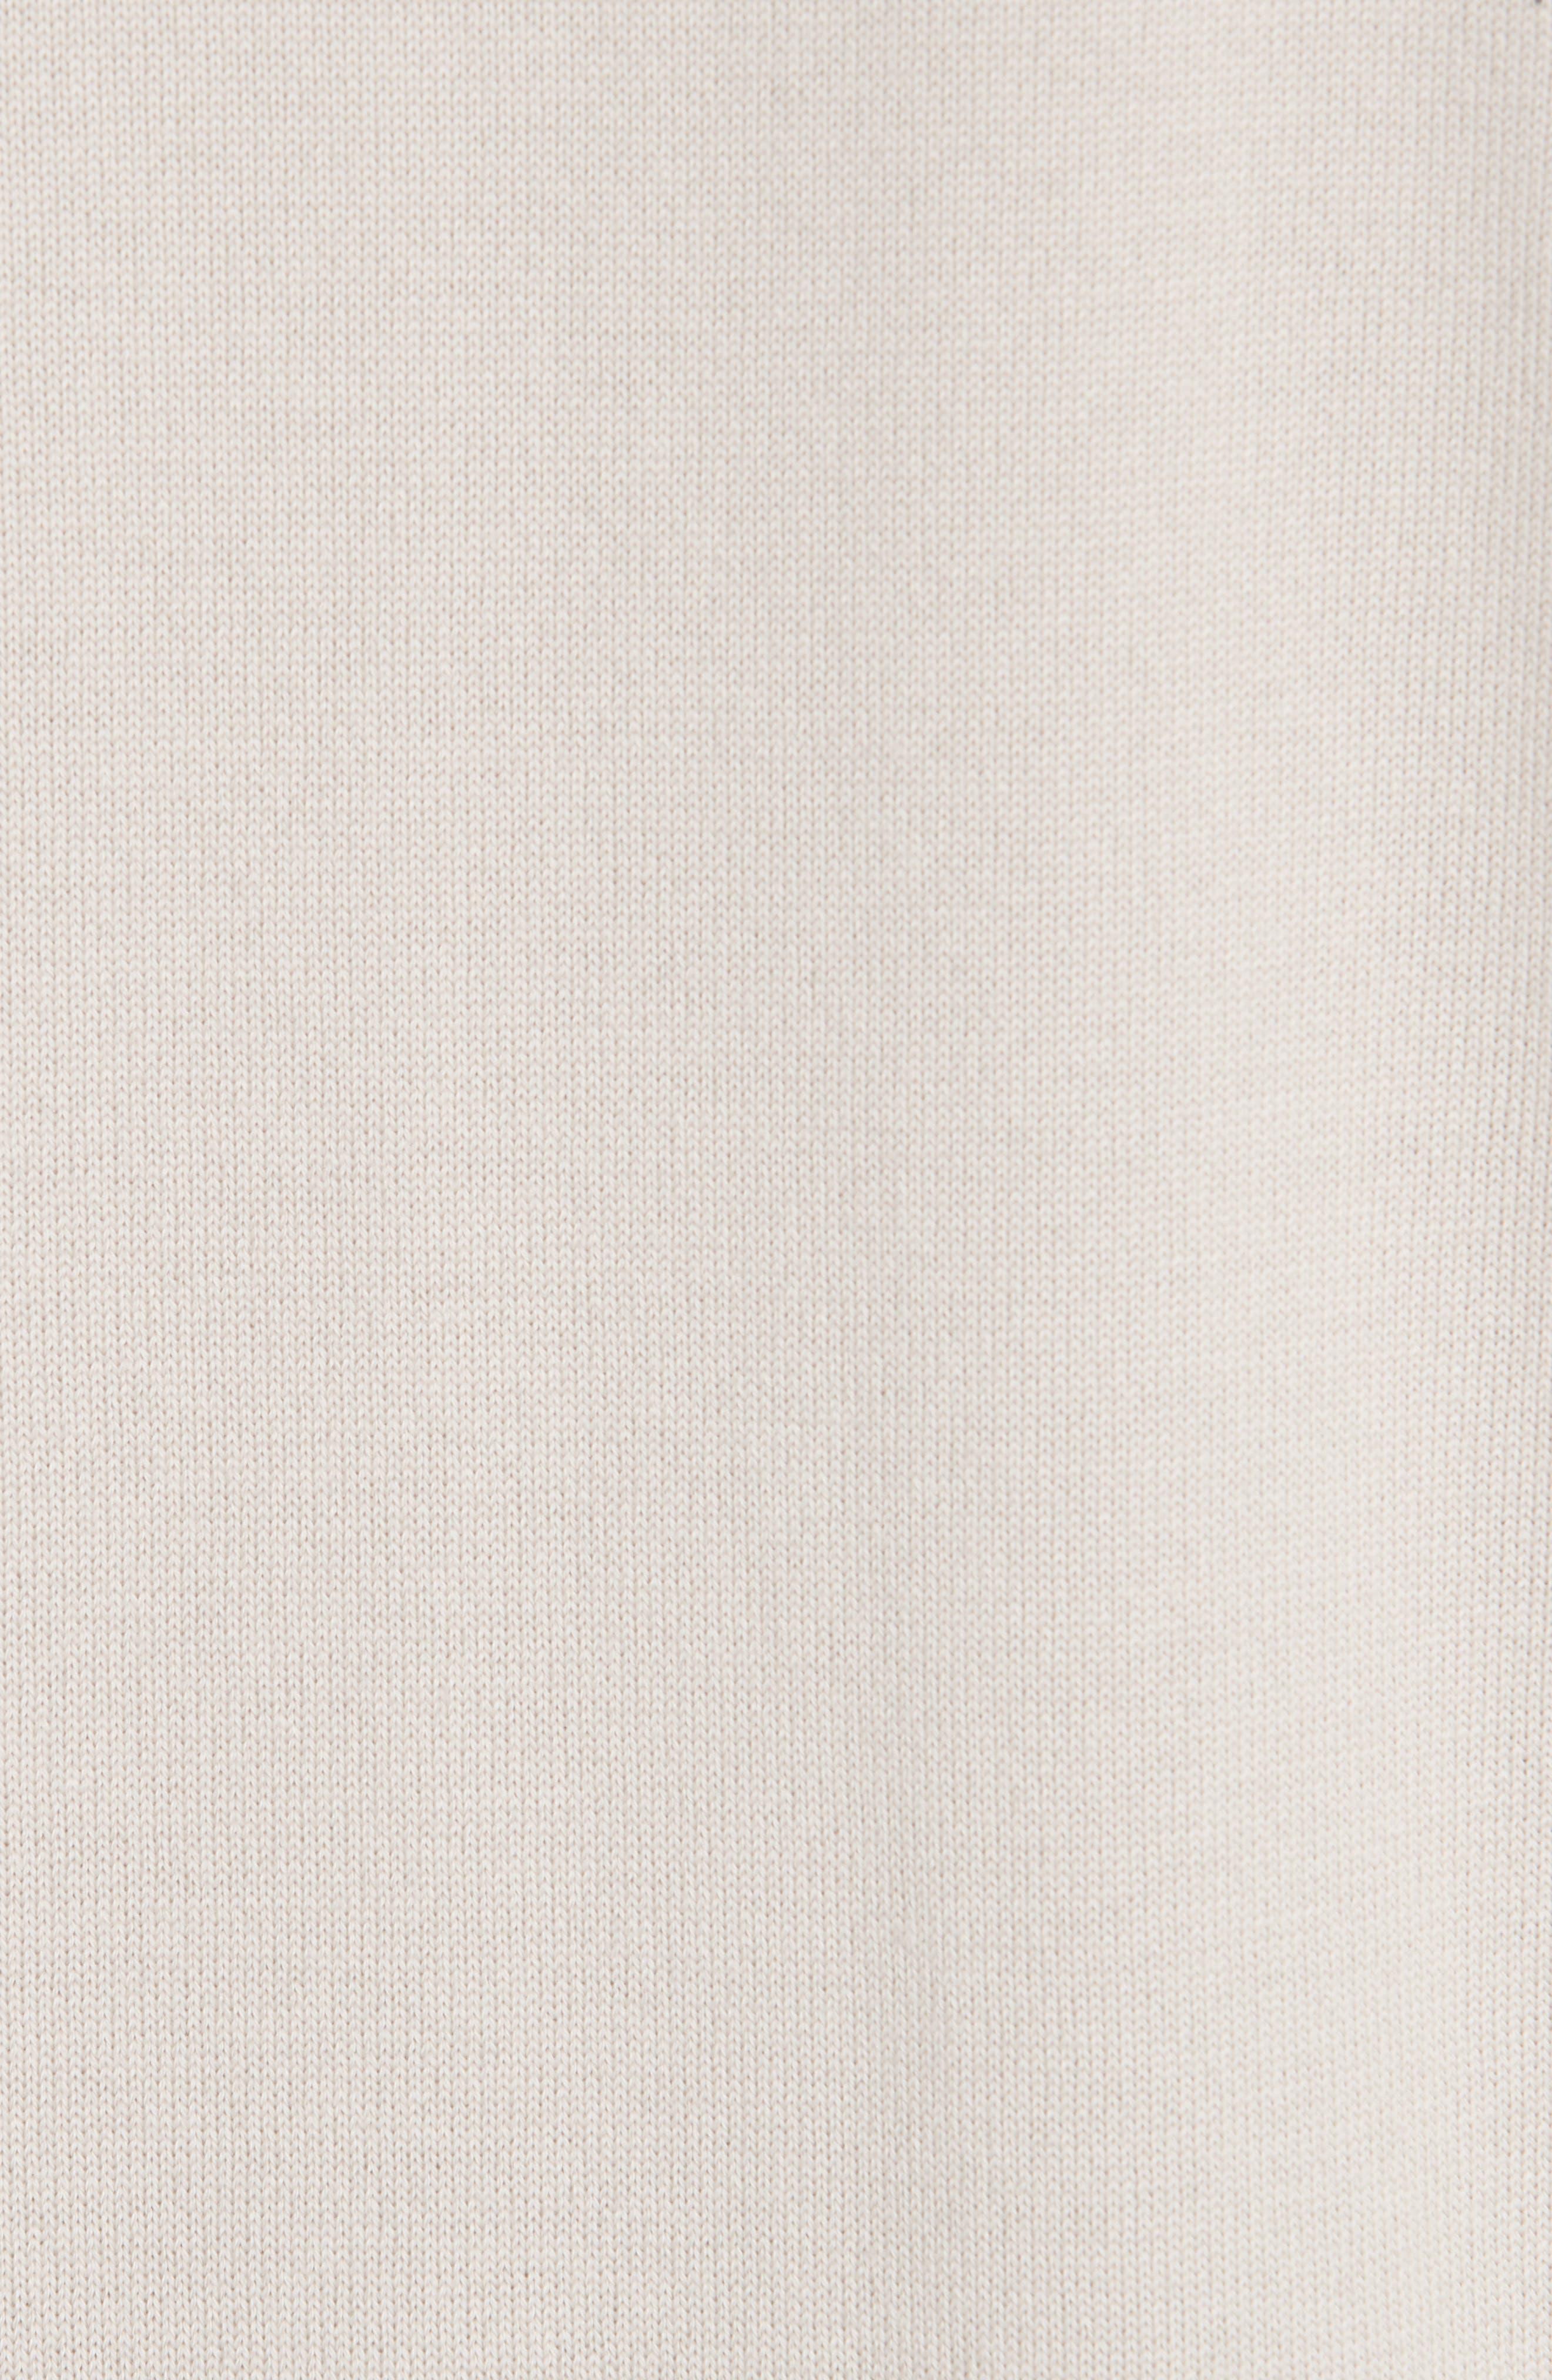 Suede, Cotton & Wool Cardigan,                             Alternate thumbnail 6, color,                             BEIGE